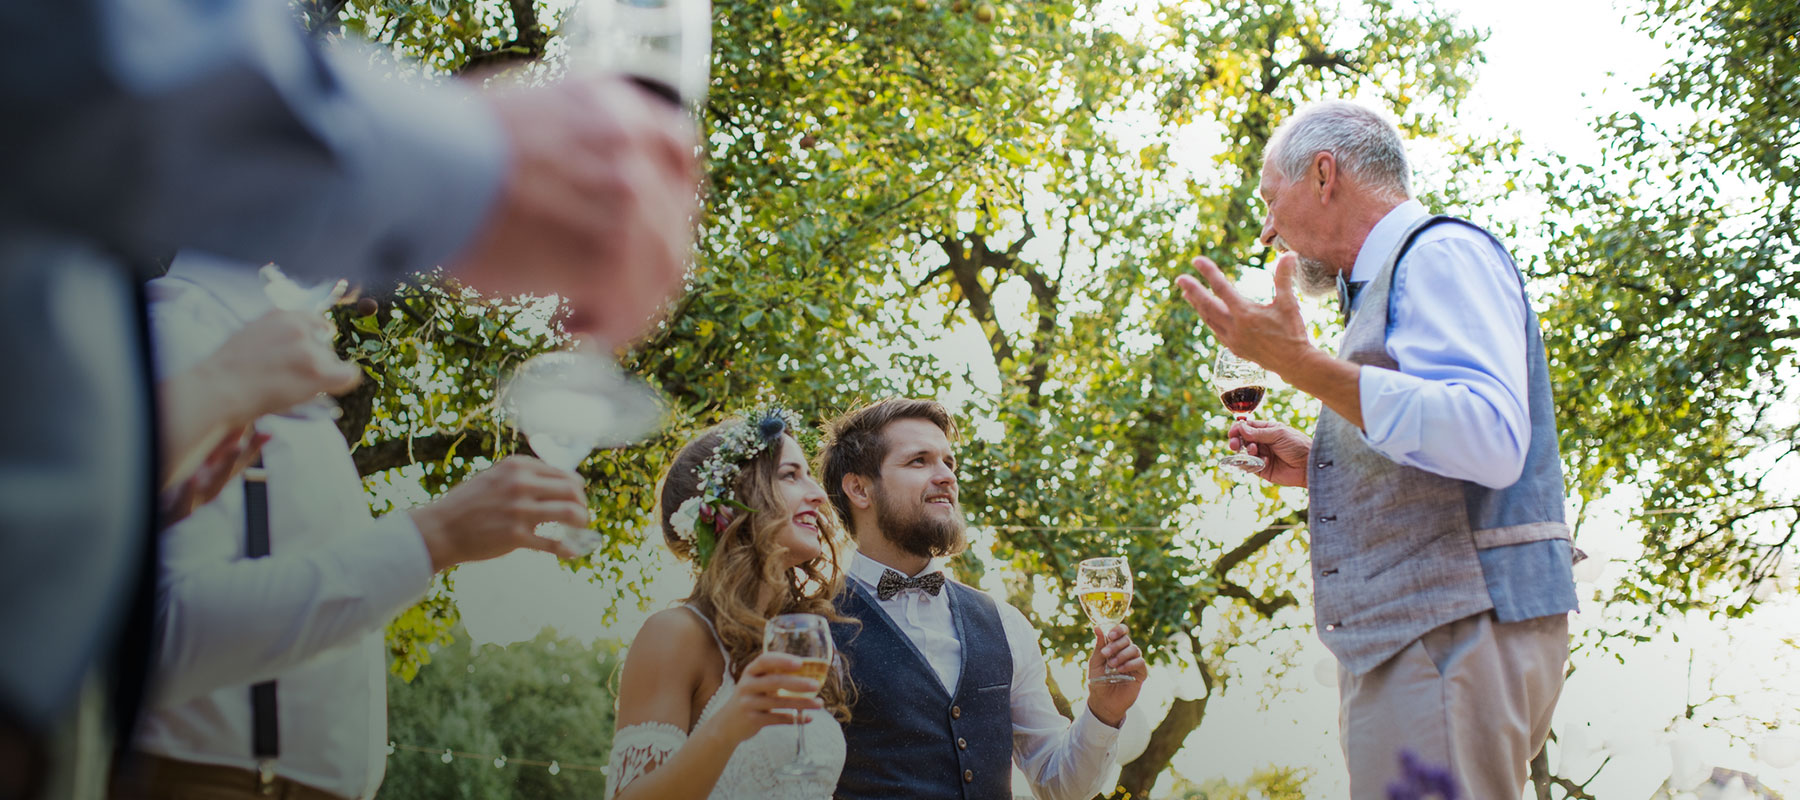 Bride And Groom Speech Advice - How To Write A Joint Speech | Speechy